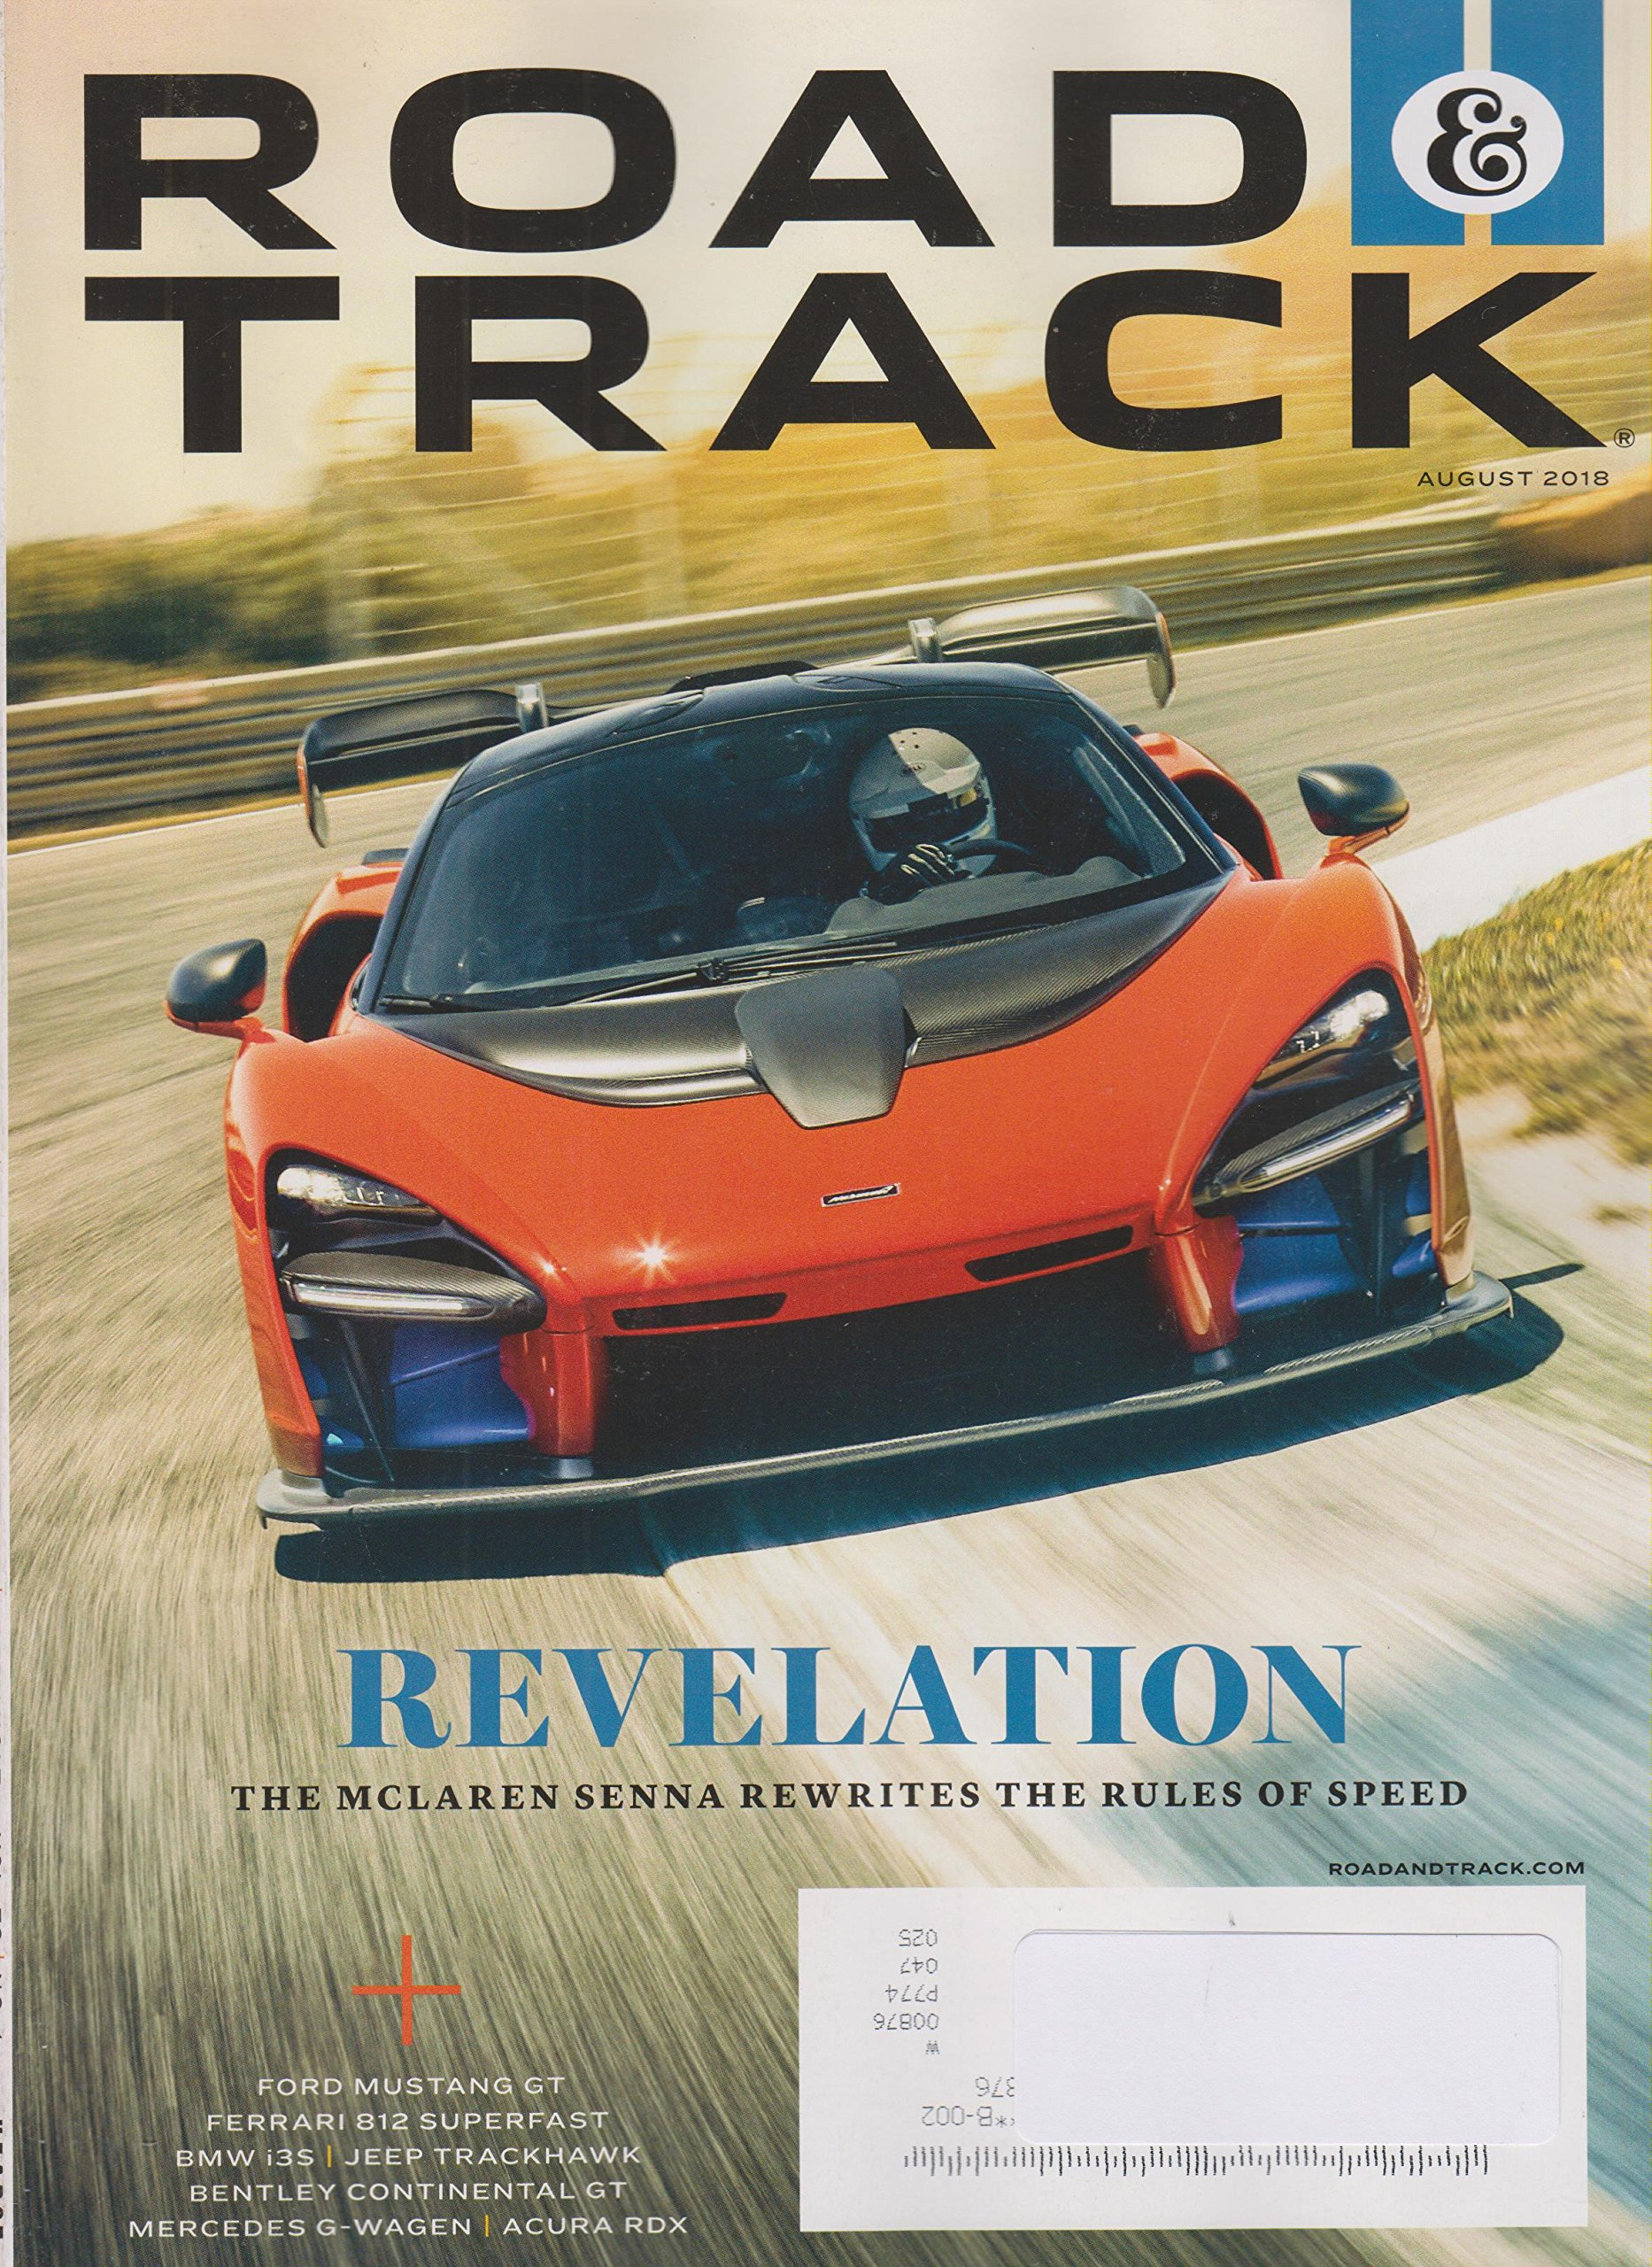 Pay Roadandtrack Com >> Road Track August 2018 Revelation The Mclaren Senna Rewrites The